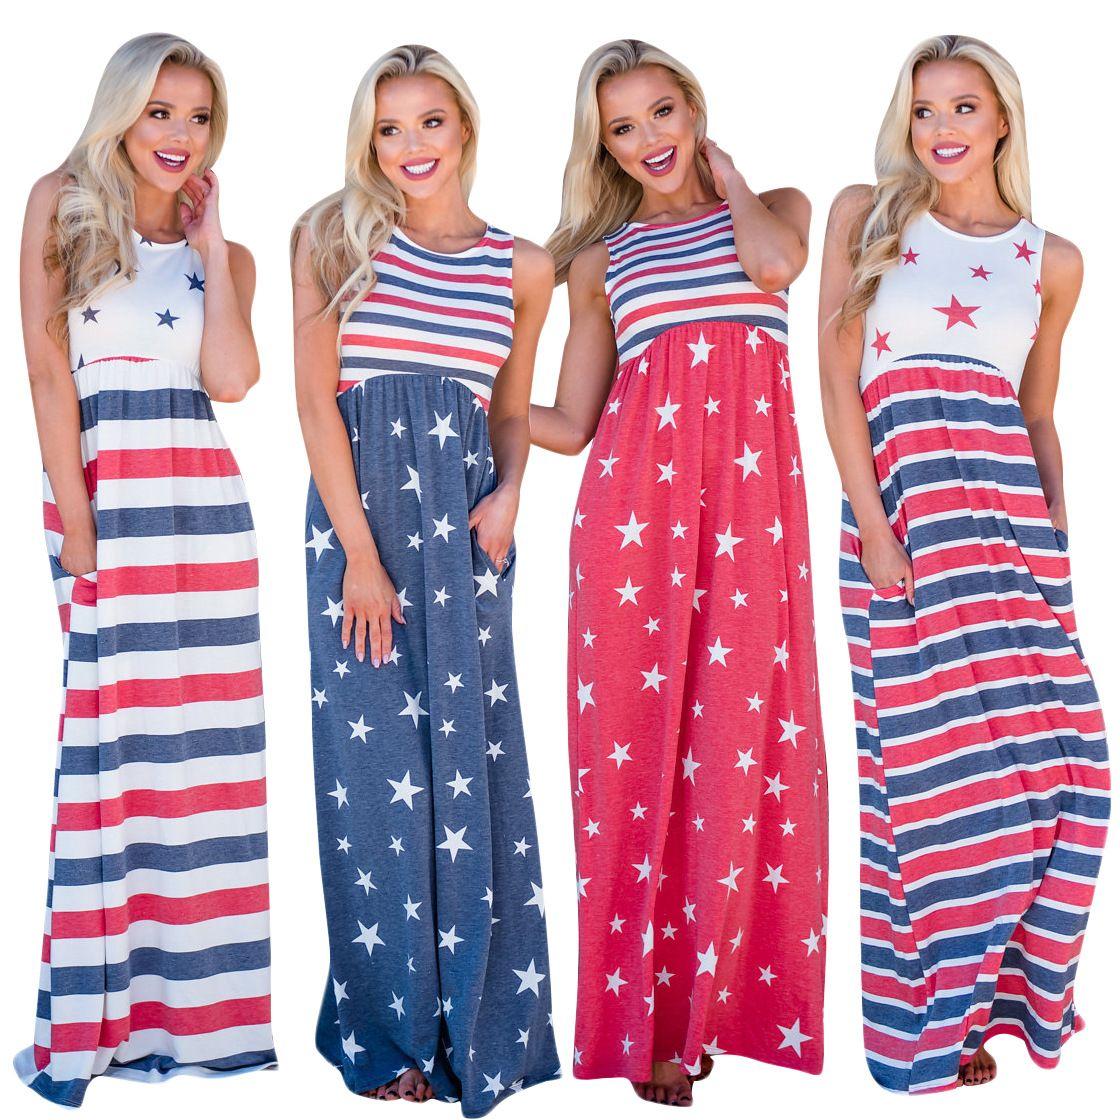 Summer Maxi Dresses Flag Striped Women Boho Style Printed Dresses Crew Neck Short Sleeves Lady Women Long Dresses